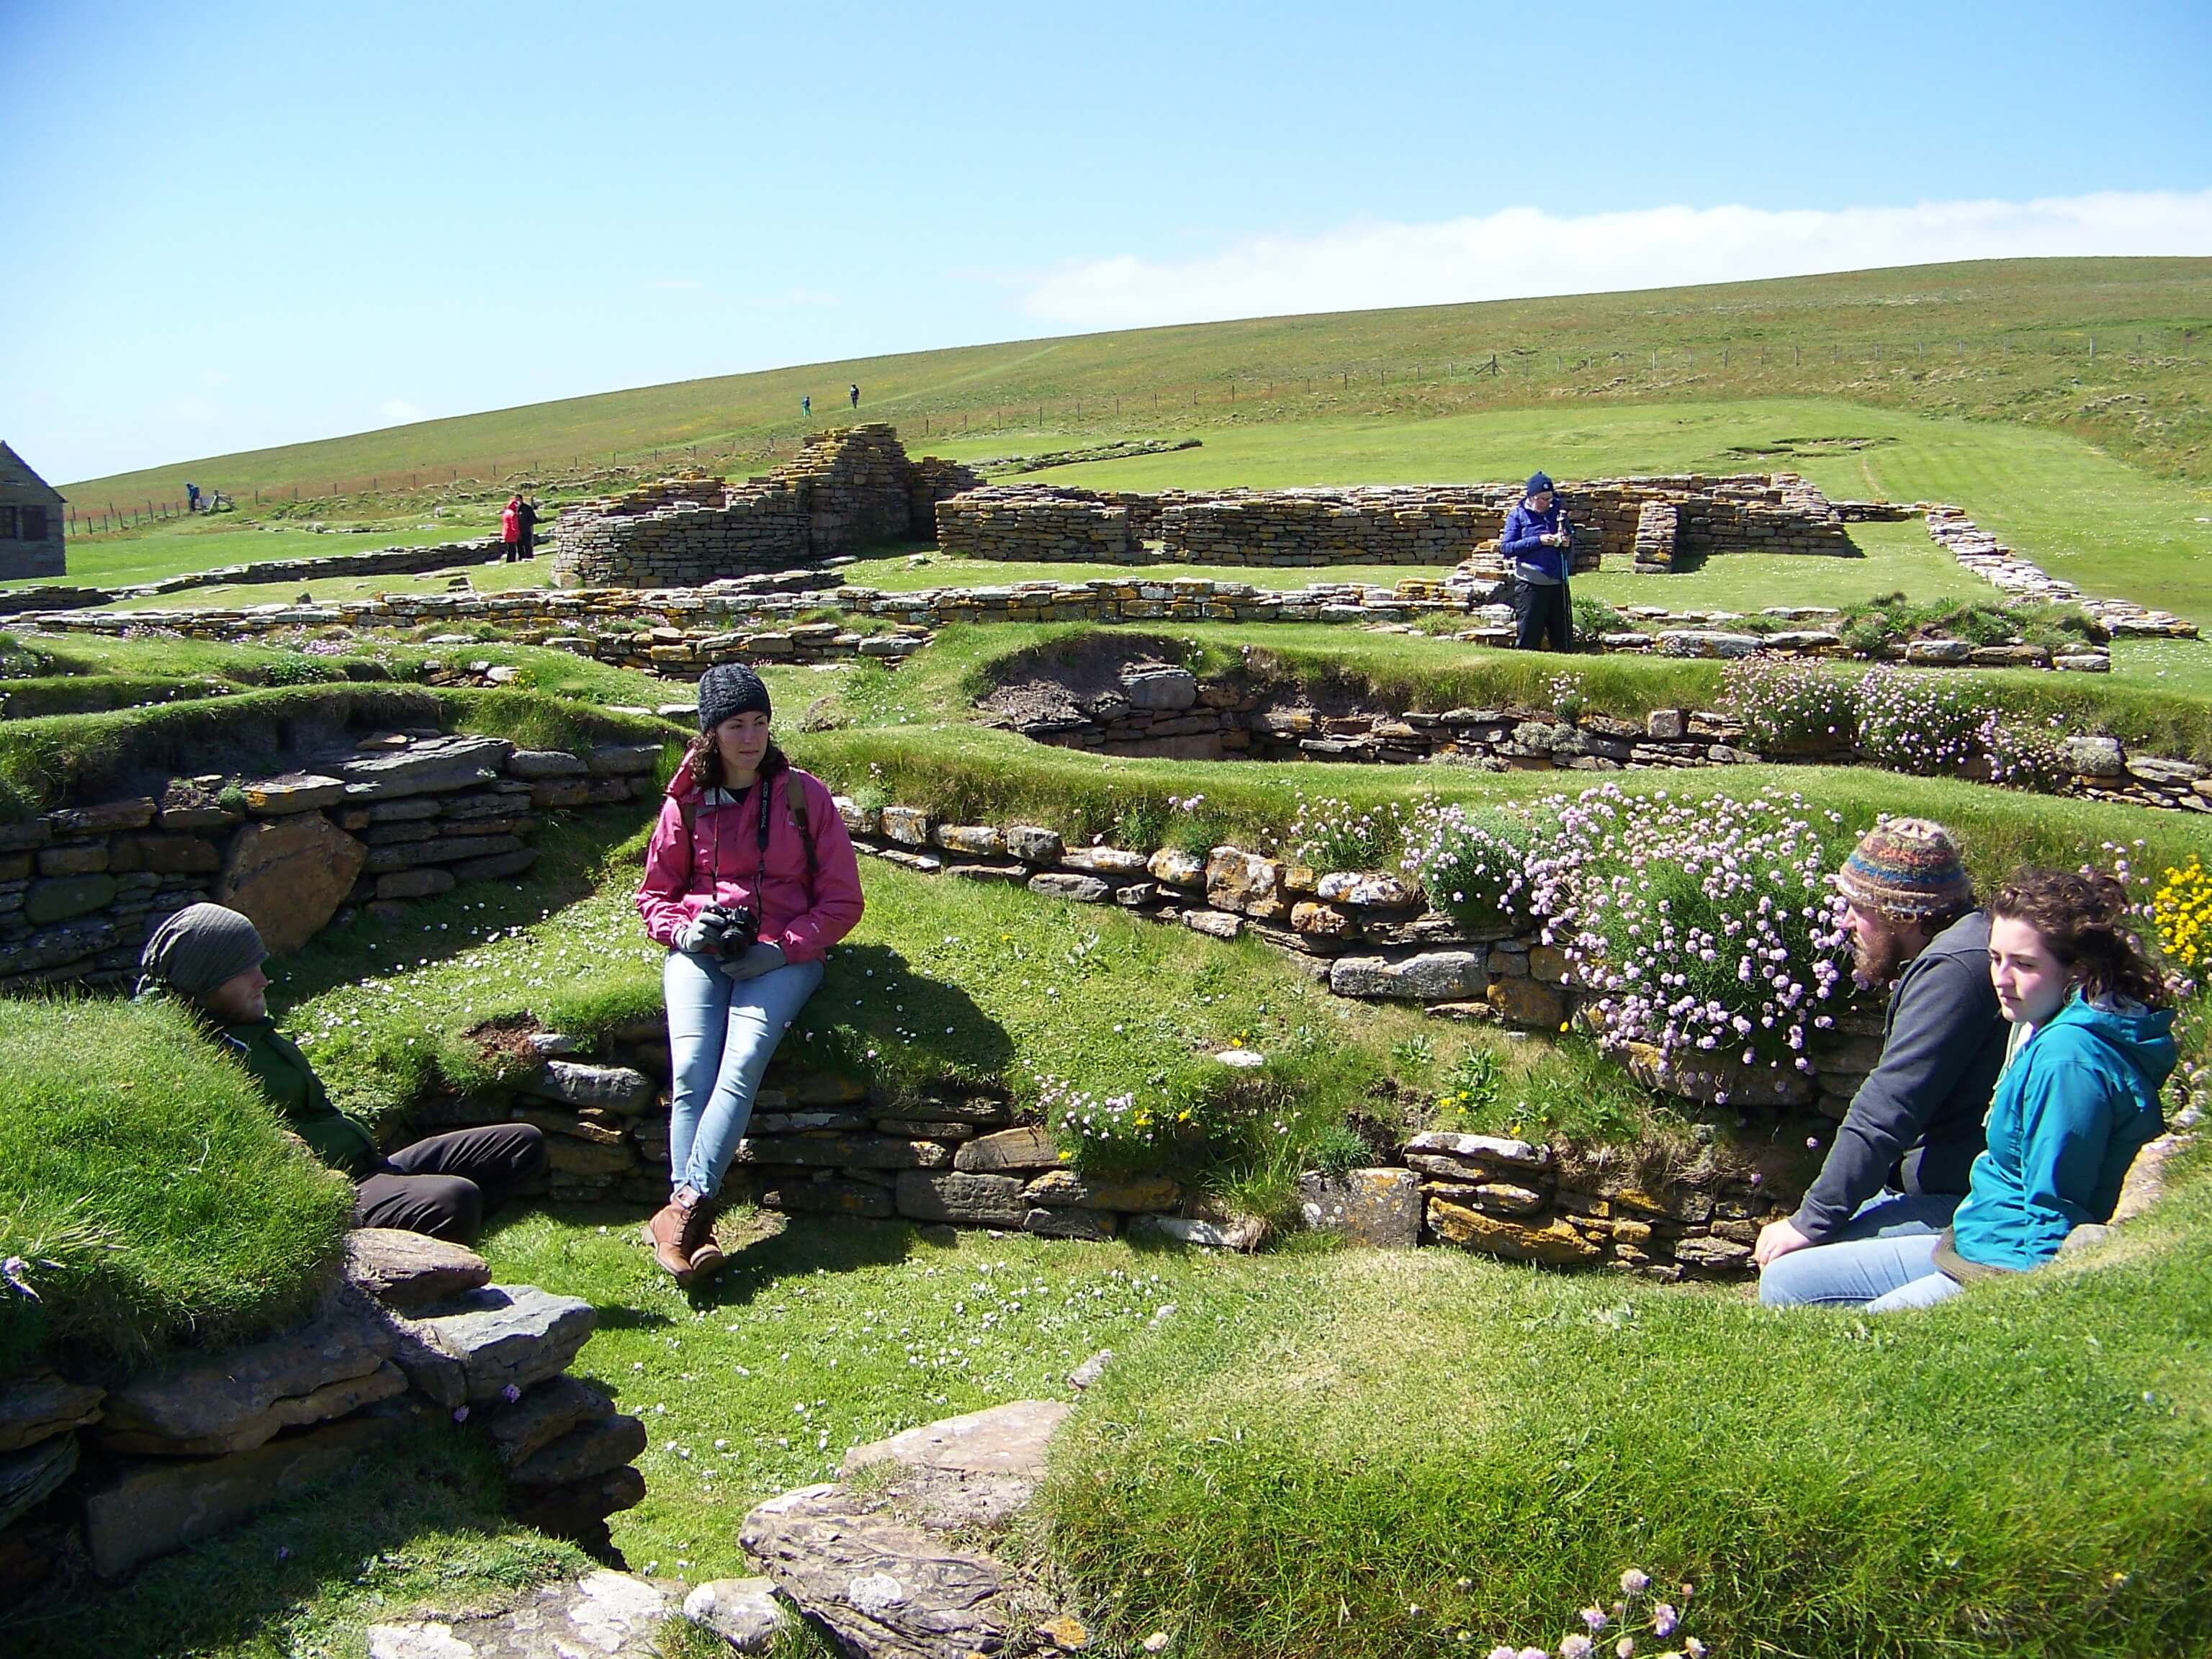 A peedie adventure in the Brough of Birsay Viking ruins